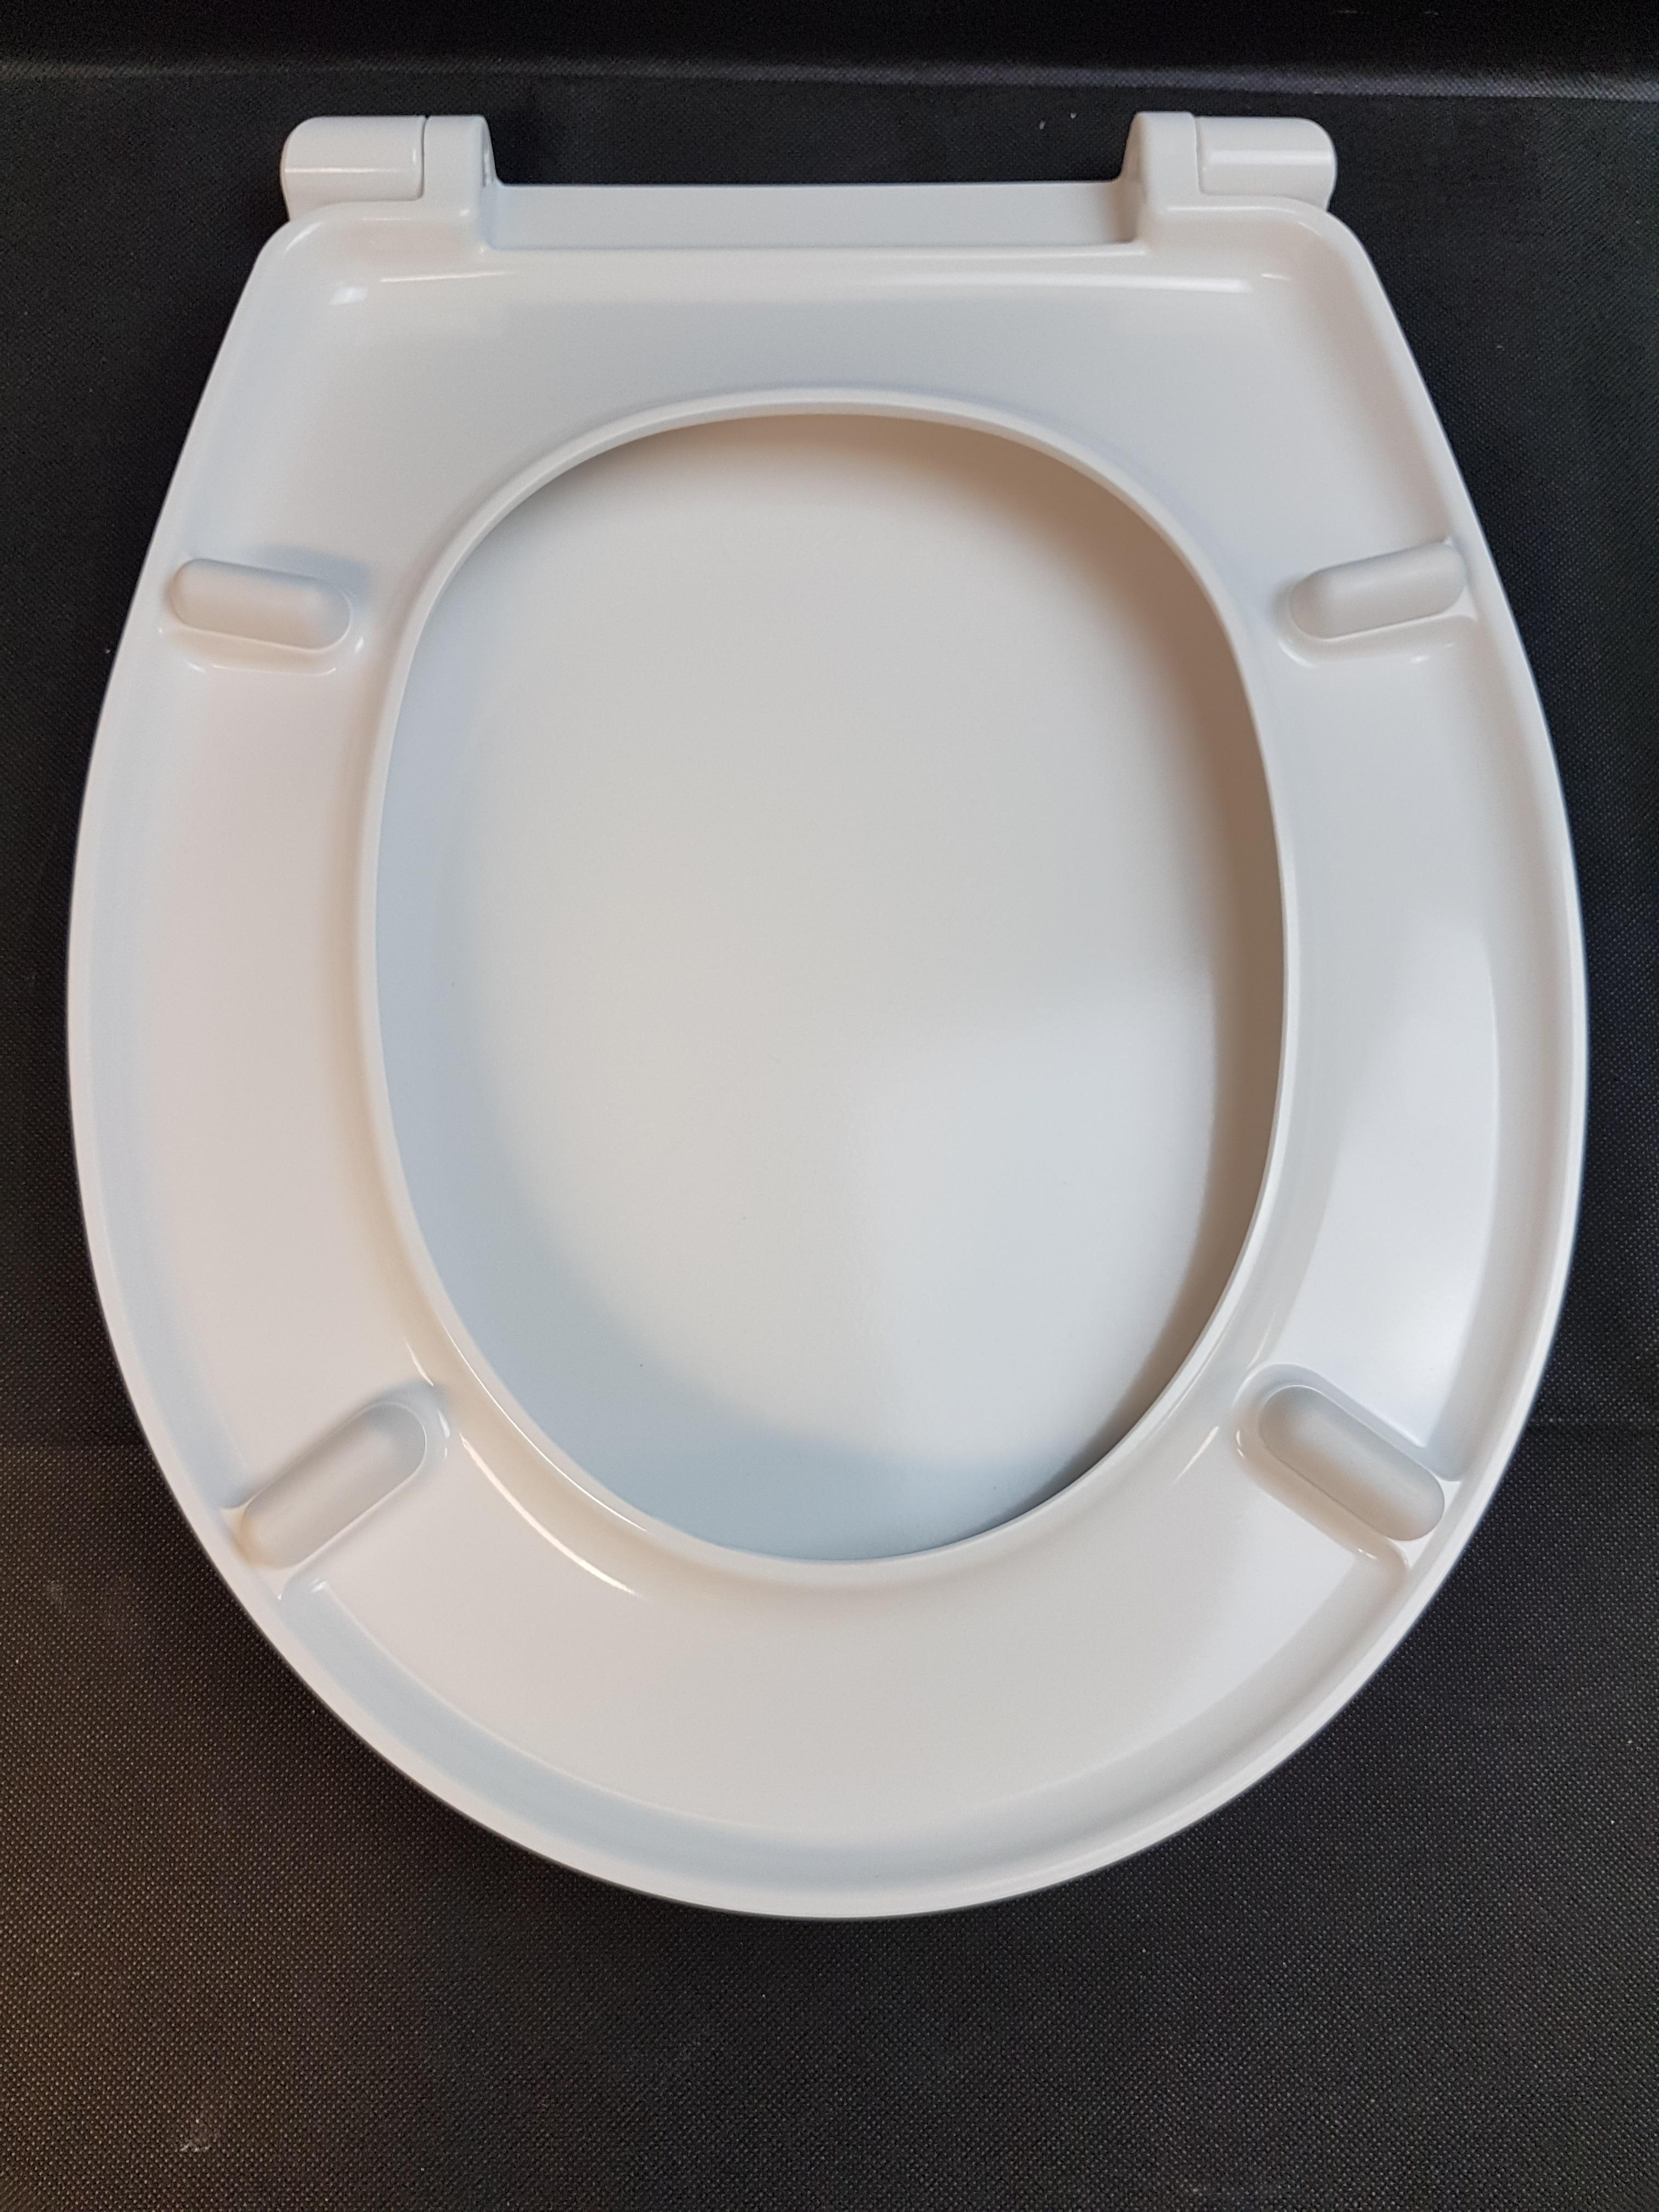 sanitaer wc sitz derby lux compact m deckel. Black Bedroom Furniture Sets. Home Design Ideas